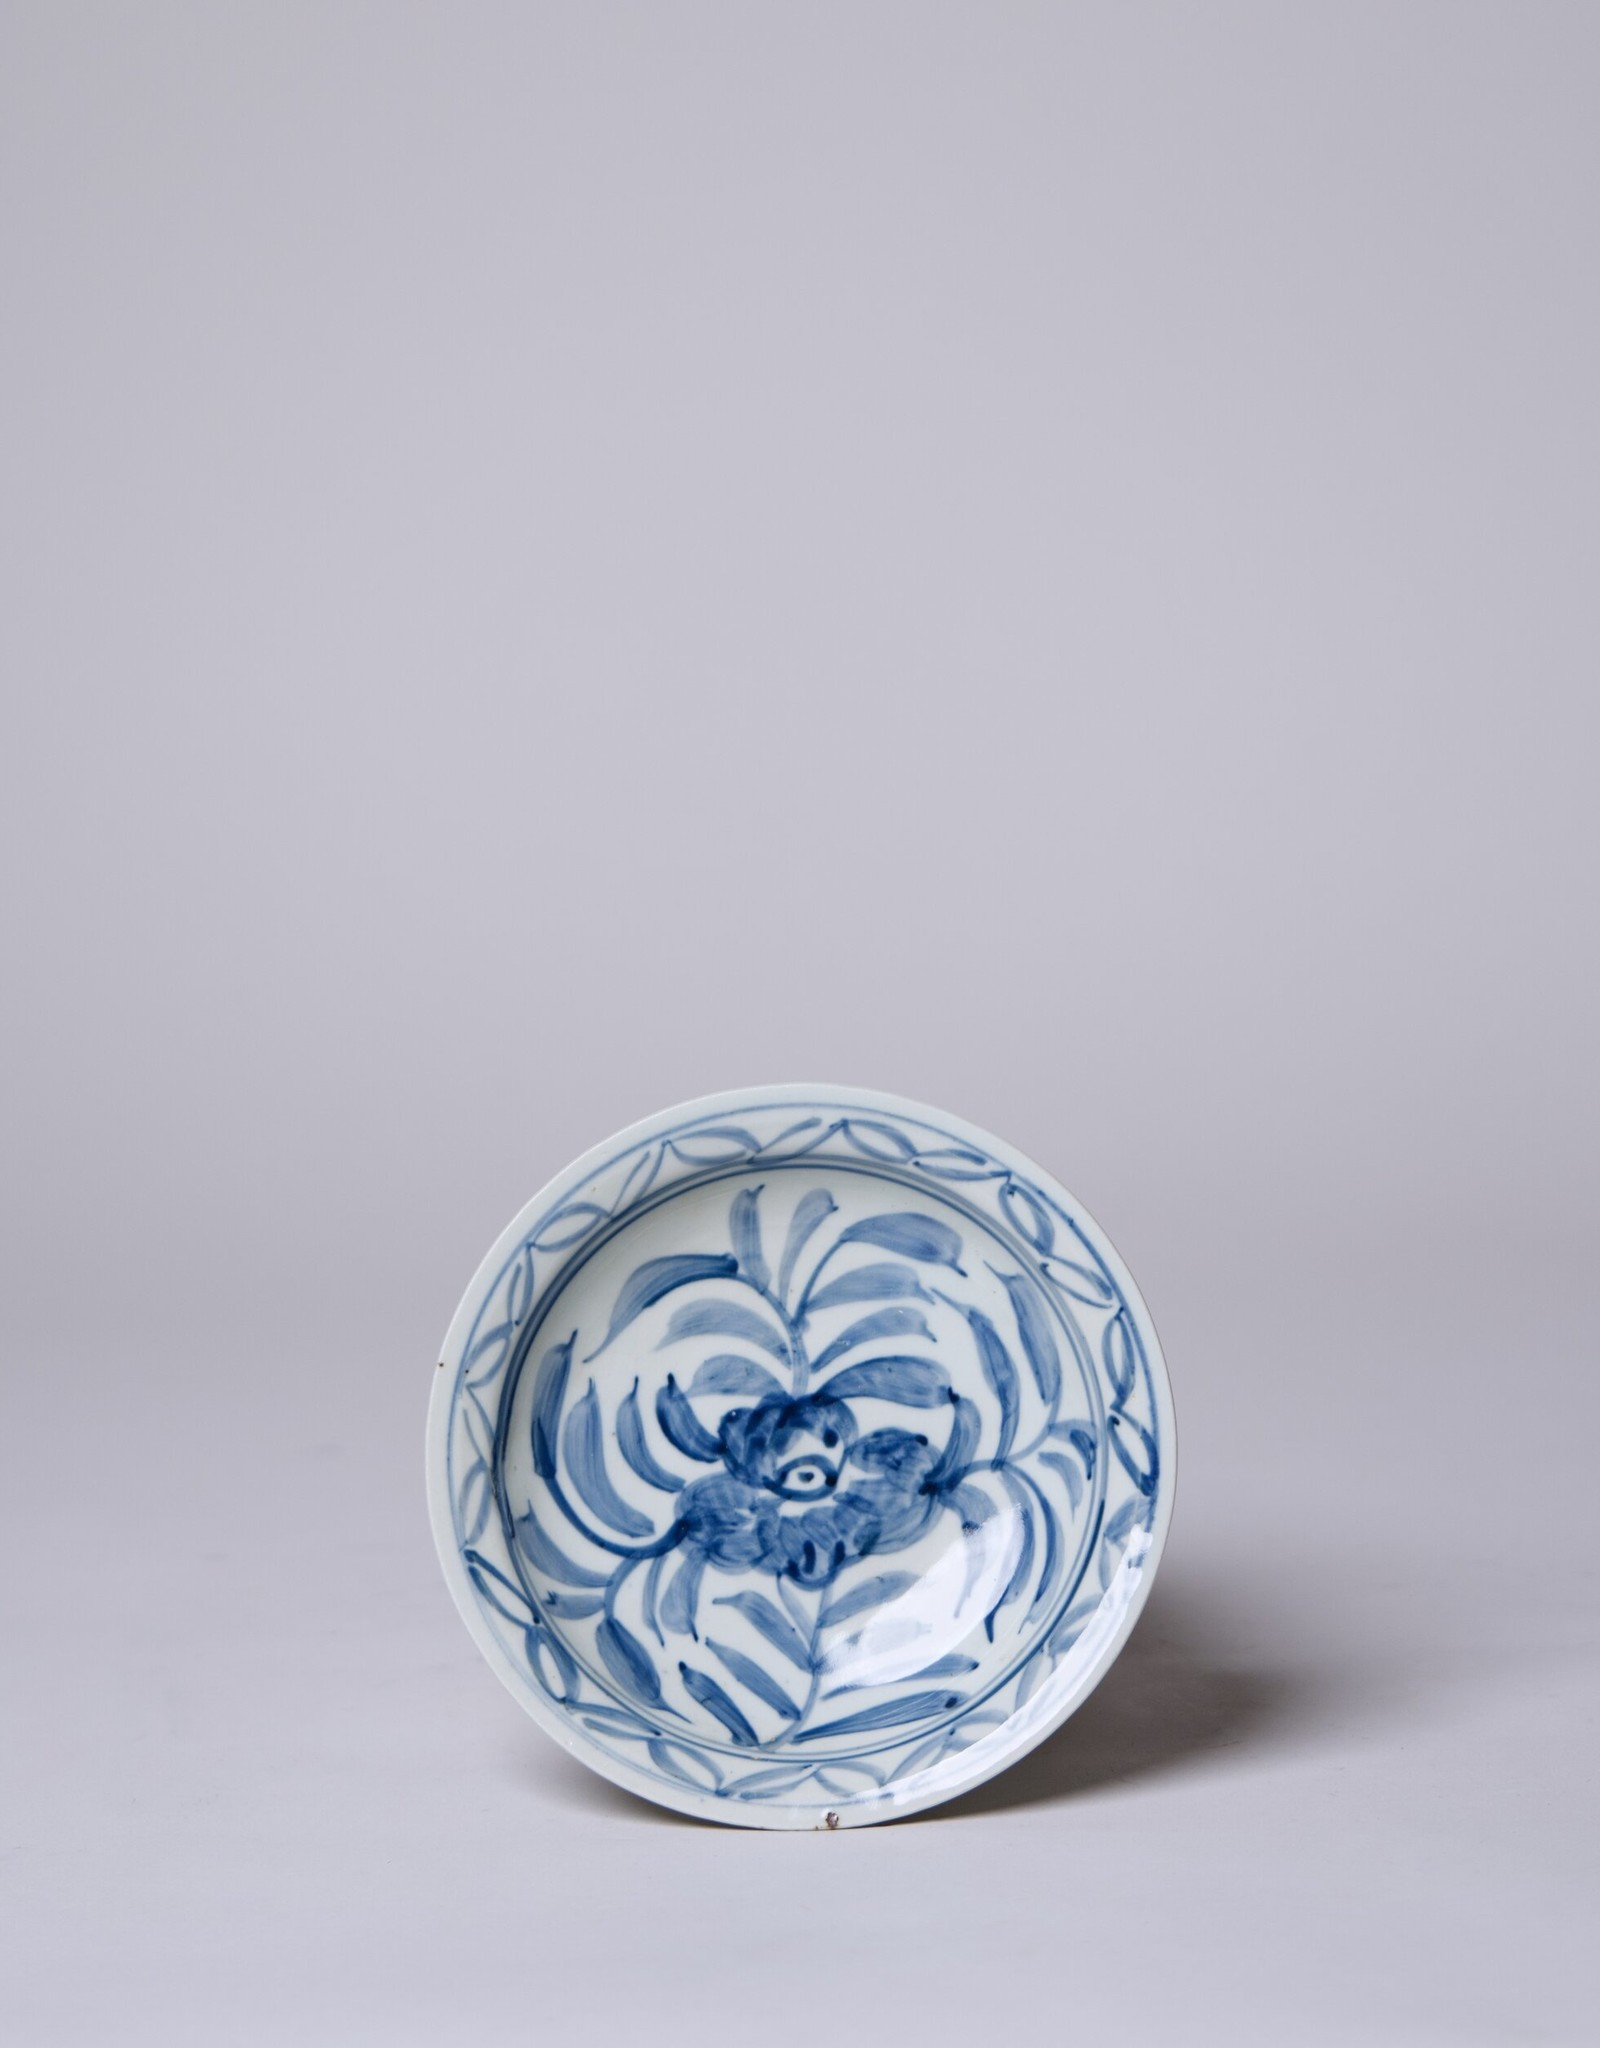 Cobalt Guild Small Floral Dish